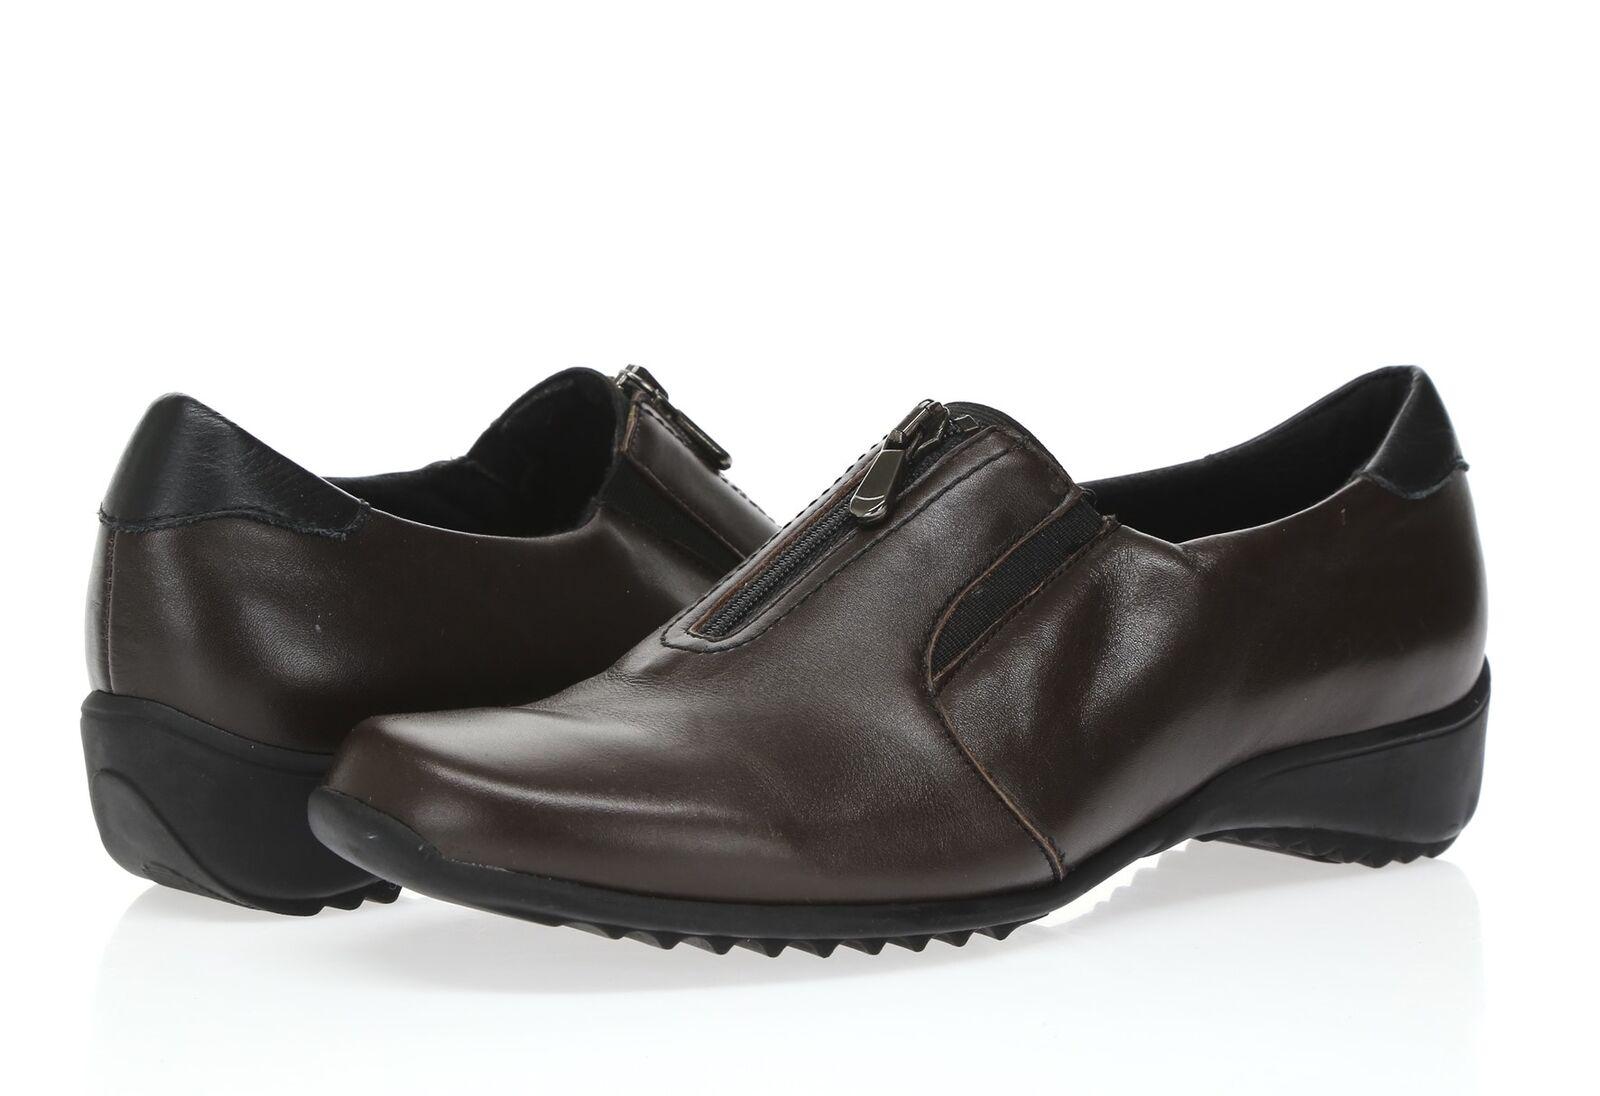 Donna MUNRO 6 Berkley Dark Brown Pelle Loafers Shoes Sz. 6 MUNRO M 1de3fe